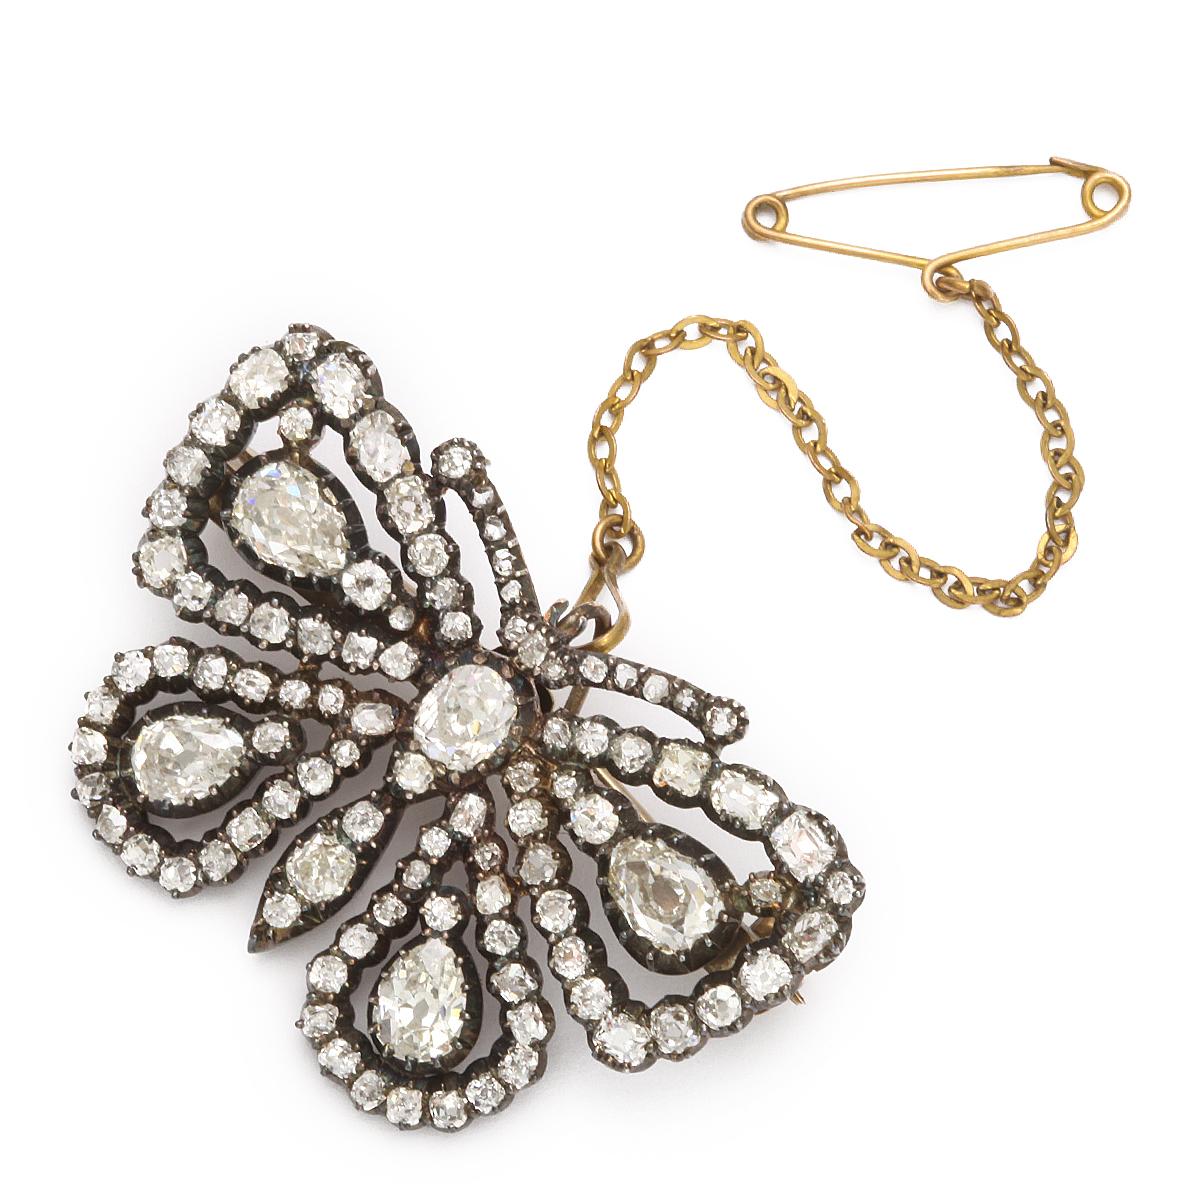 Butterfly Brooch Vintage Old Jewelry